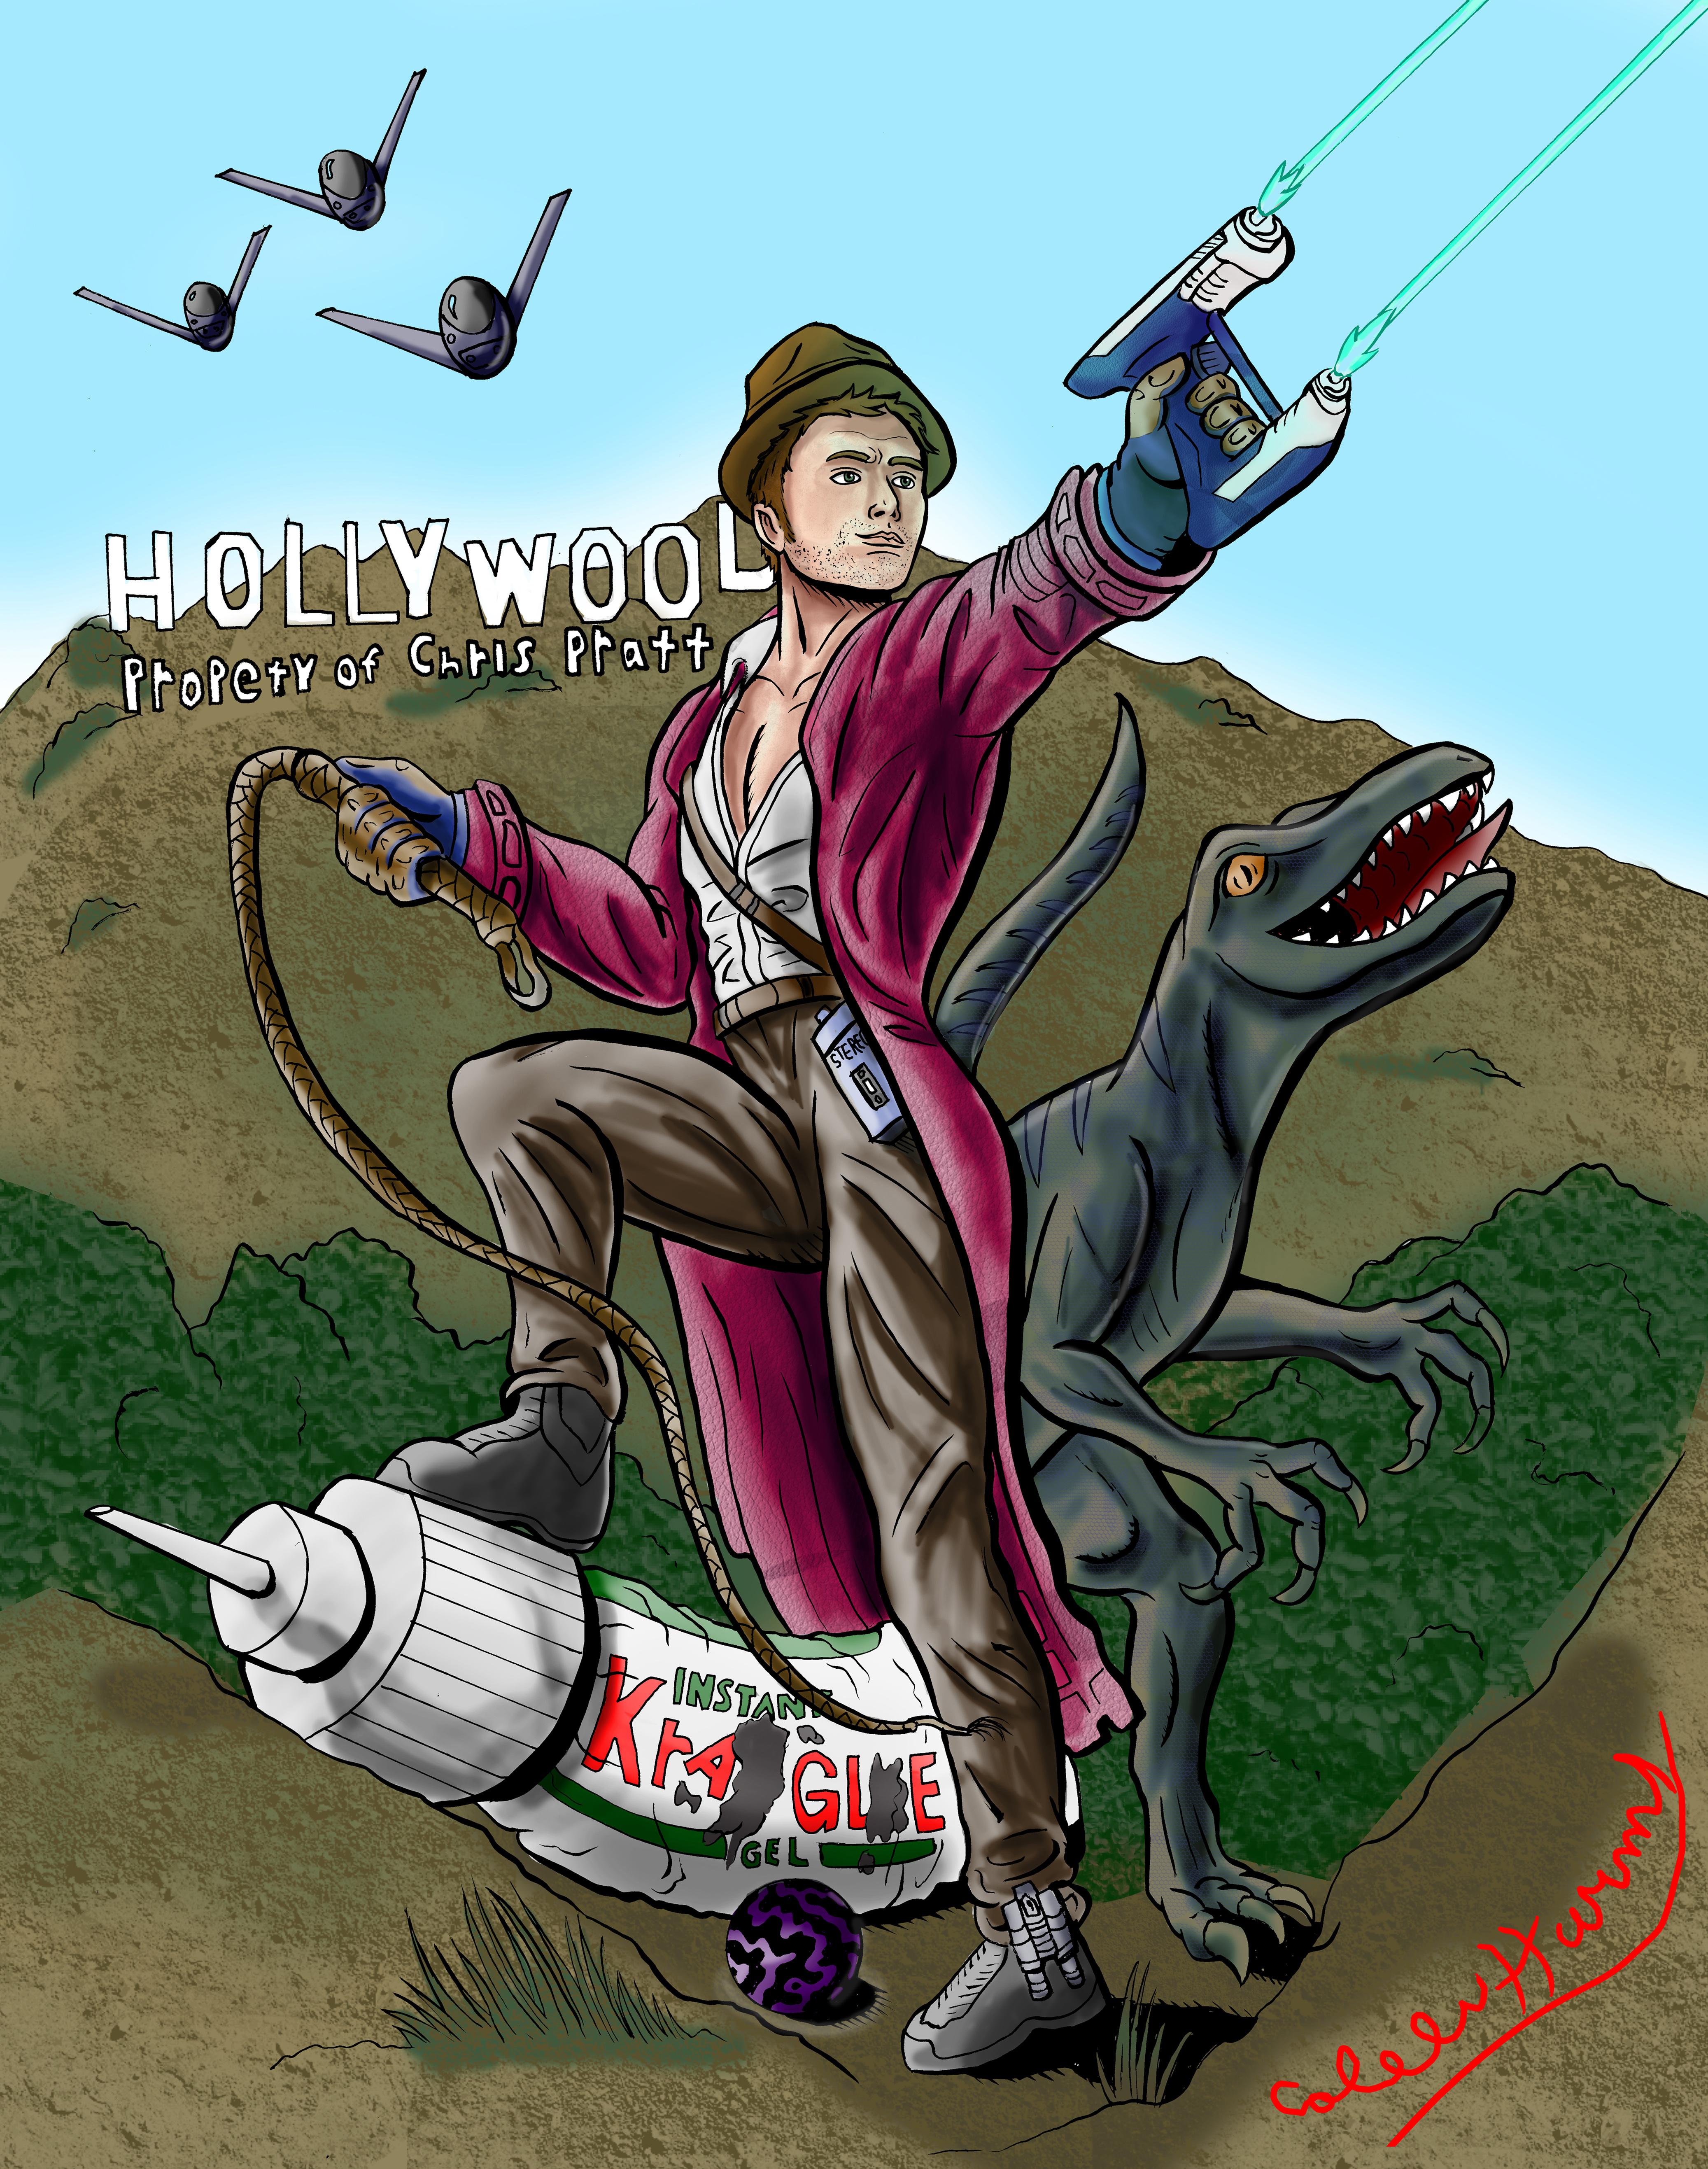 Hollywood, Property of Chris Pratt